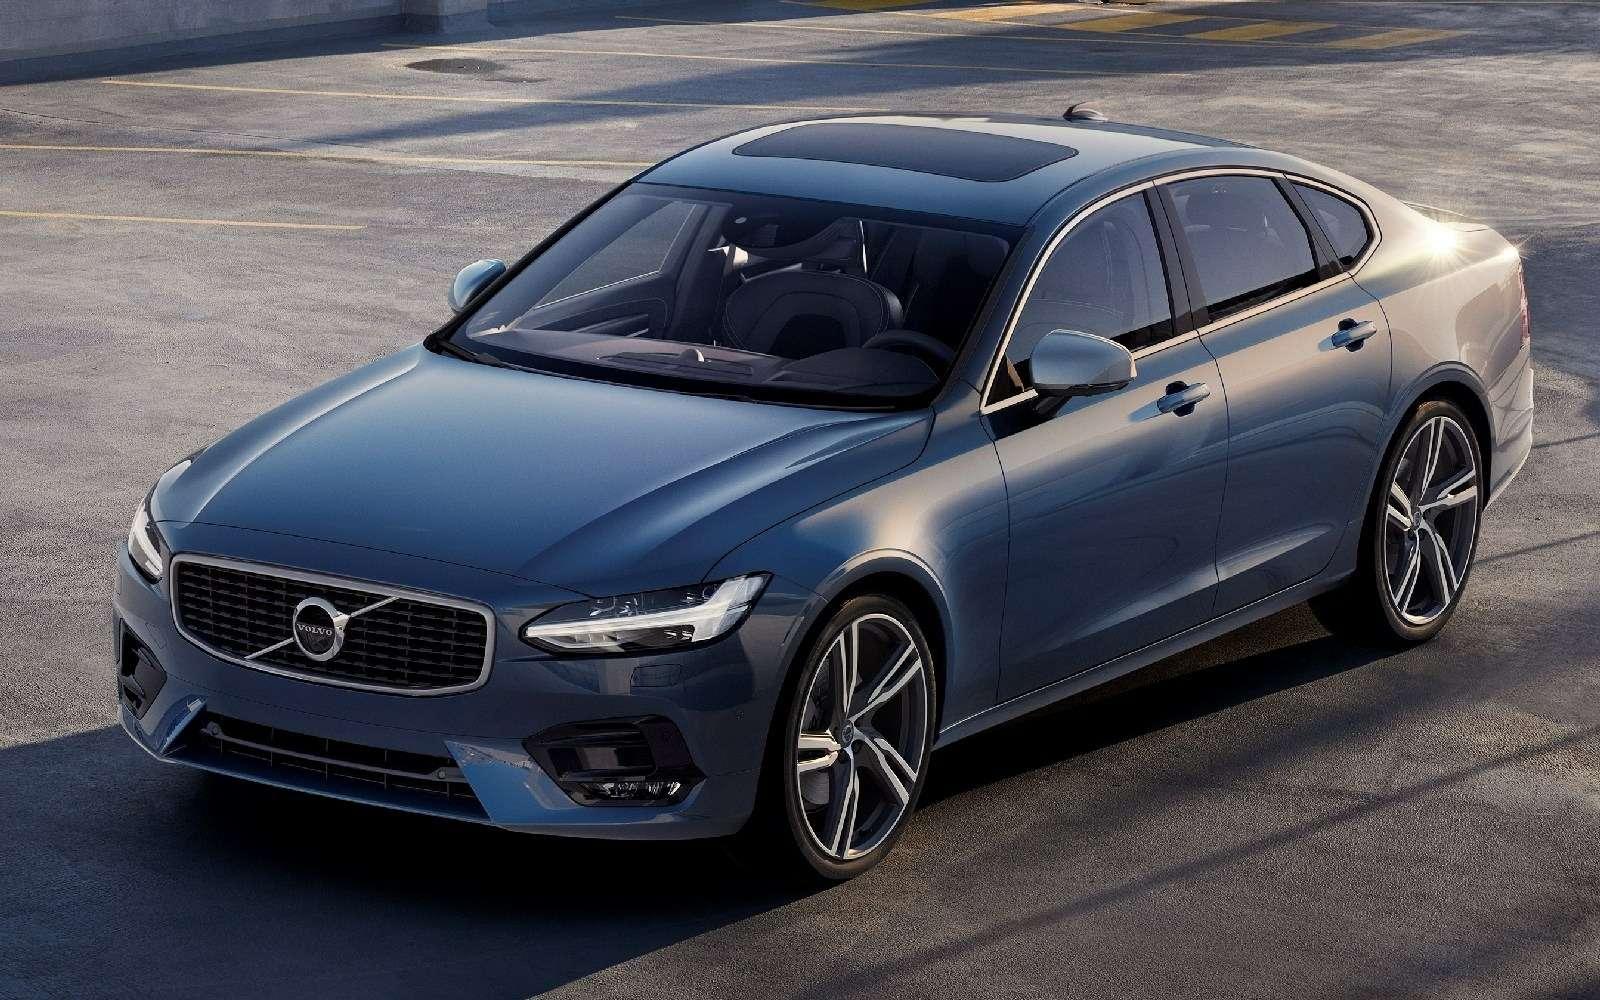 Volvo подготовила дляфлагманской модели спортпакет R-Design— фото 600930